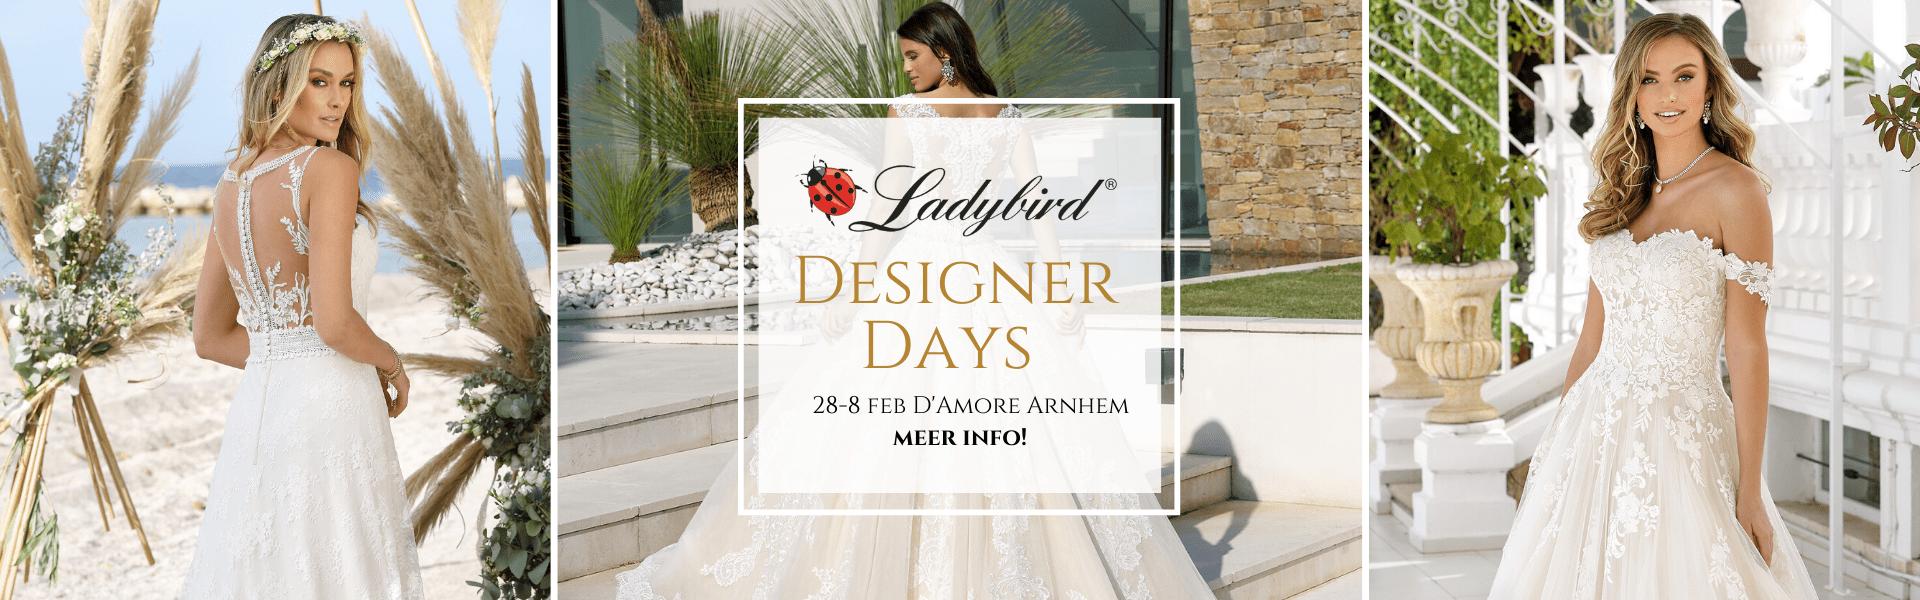 Ladybird Designer Days